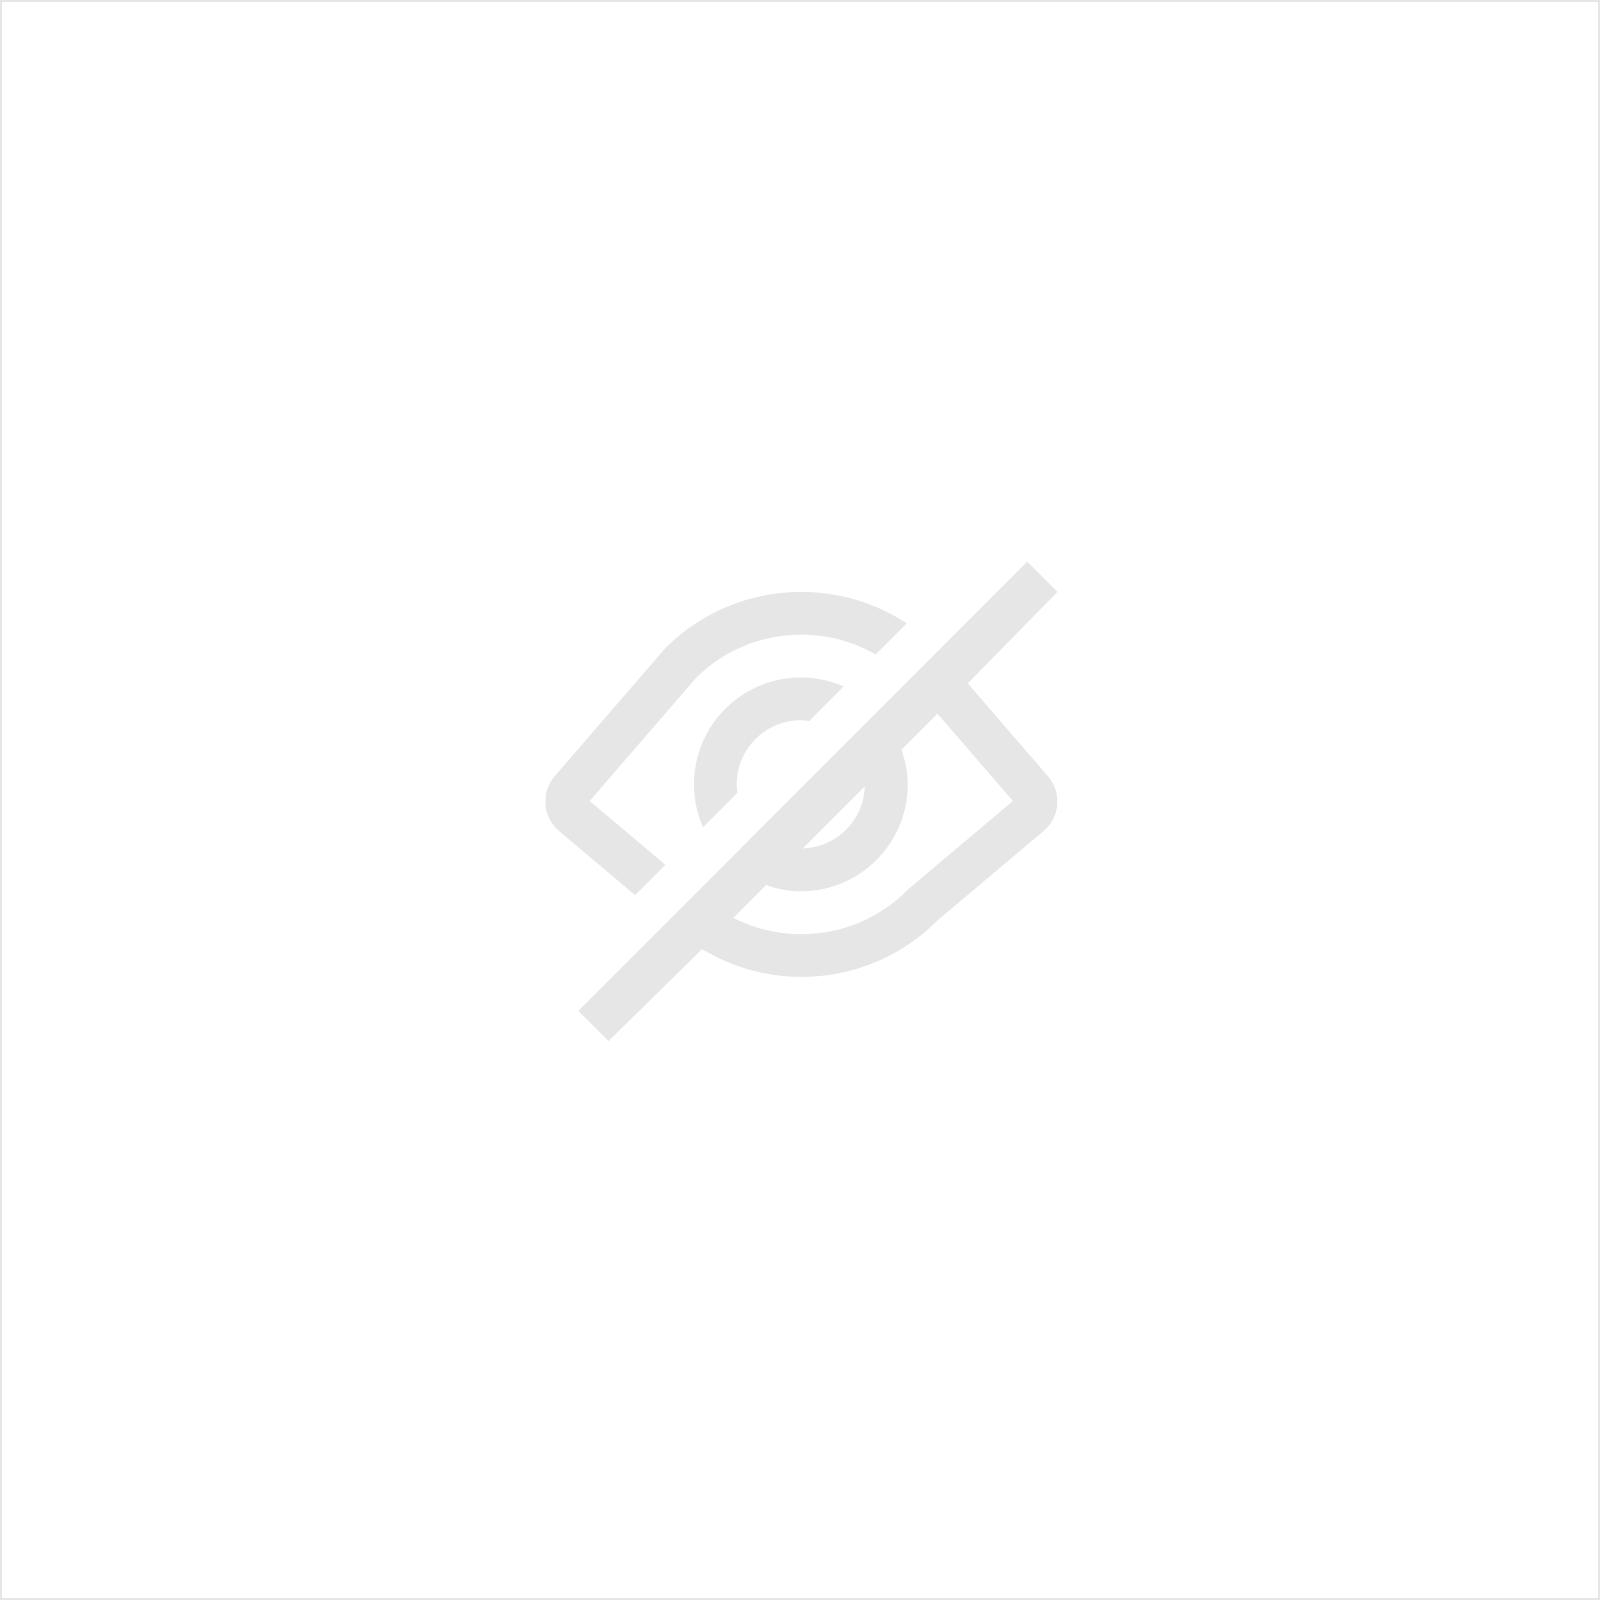 RONDE BORSTEL MET MESSINGDRAAD 200 x 20 /  0,35